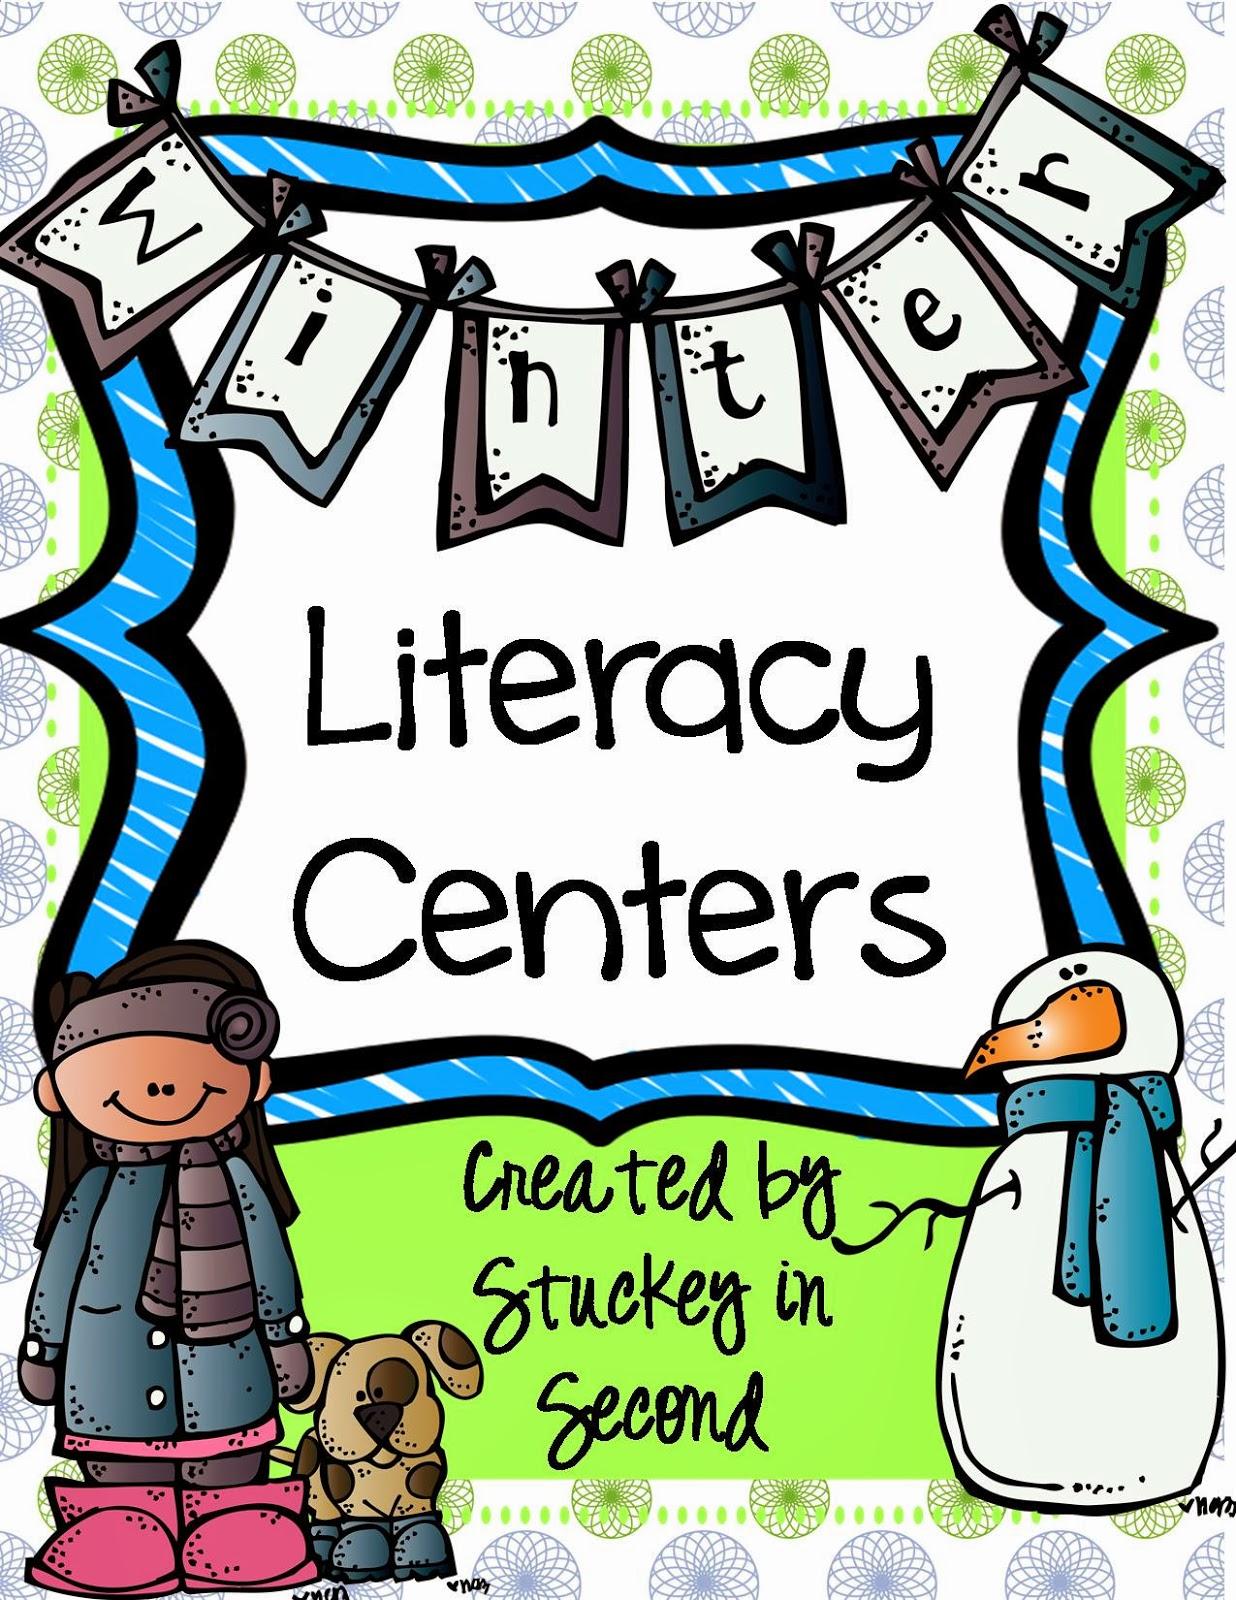 http://www.teacherspayteachers.com/Product/Winter-Literacy-Centers-5-Centers-Included-1032737